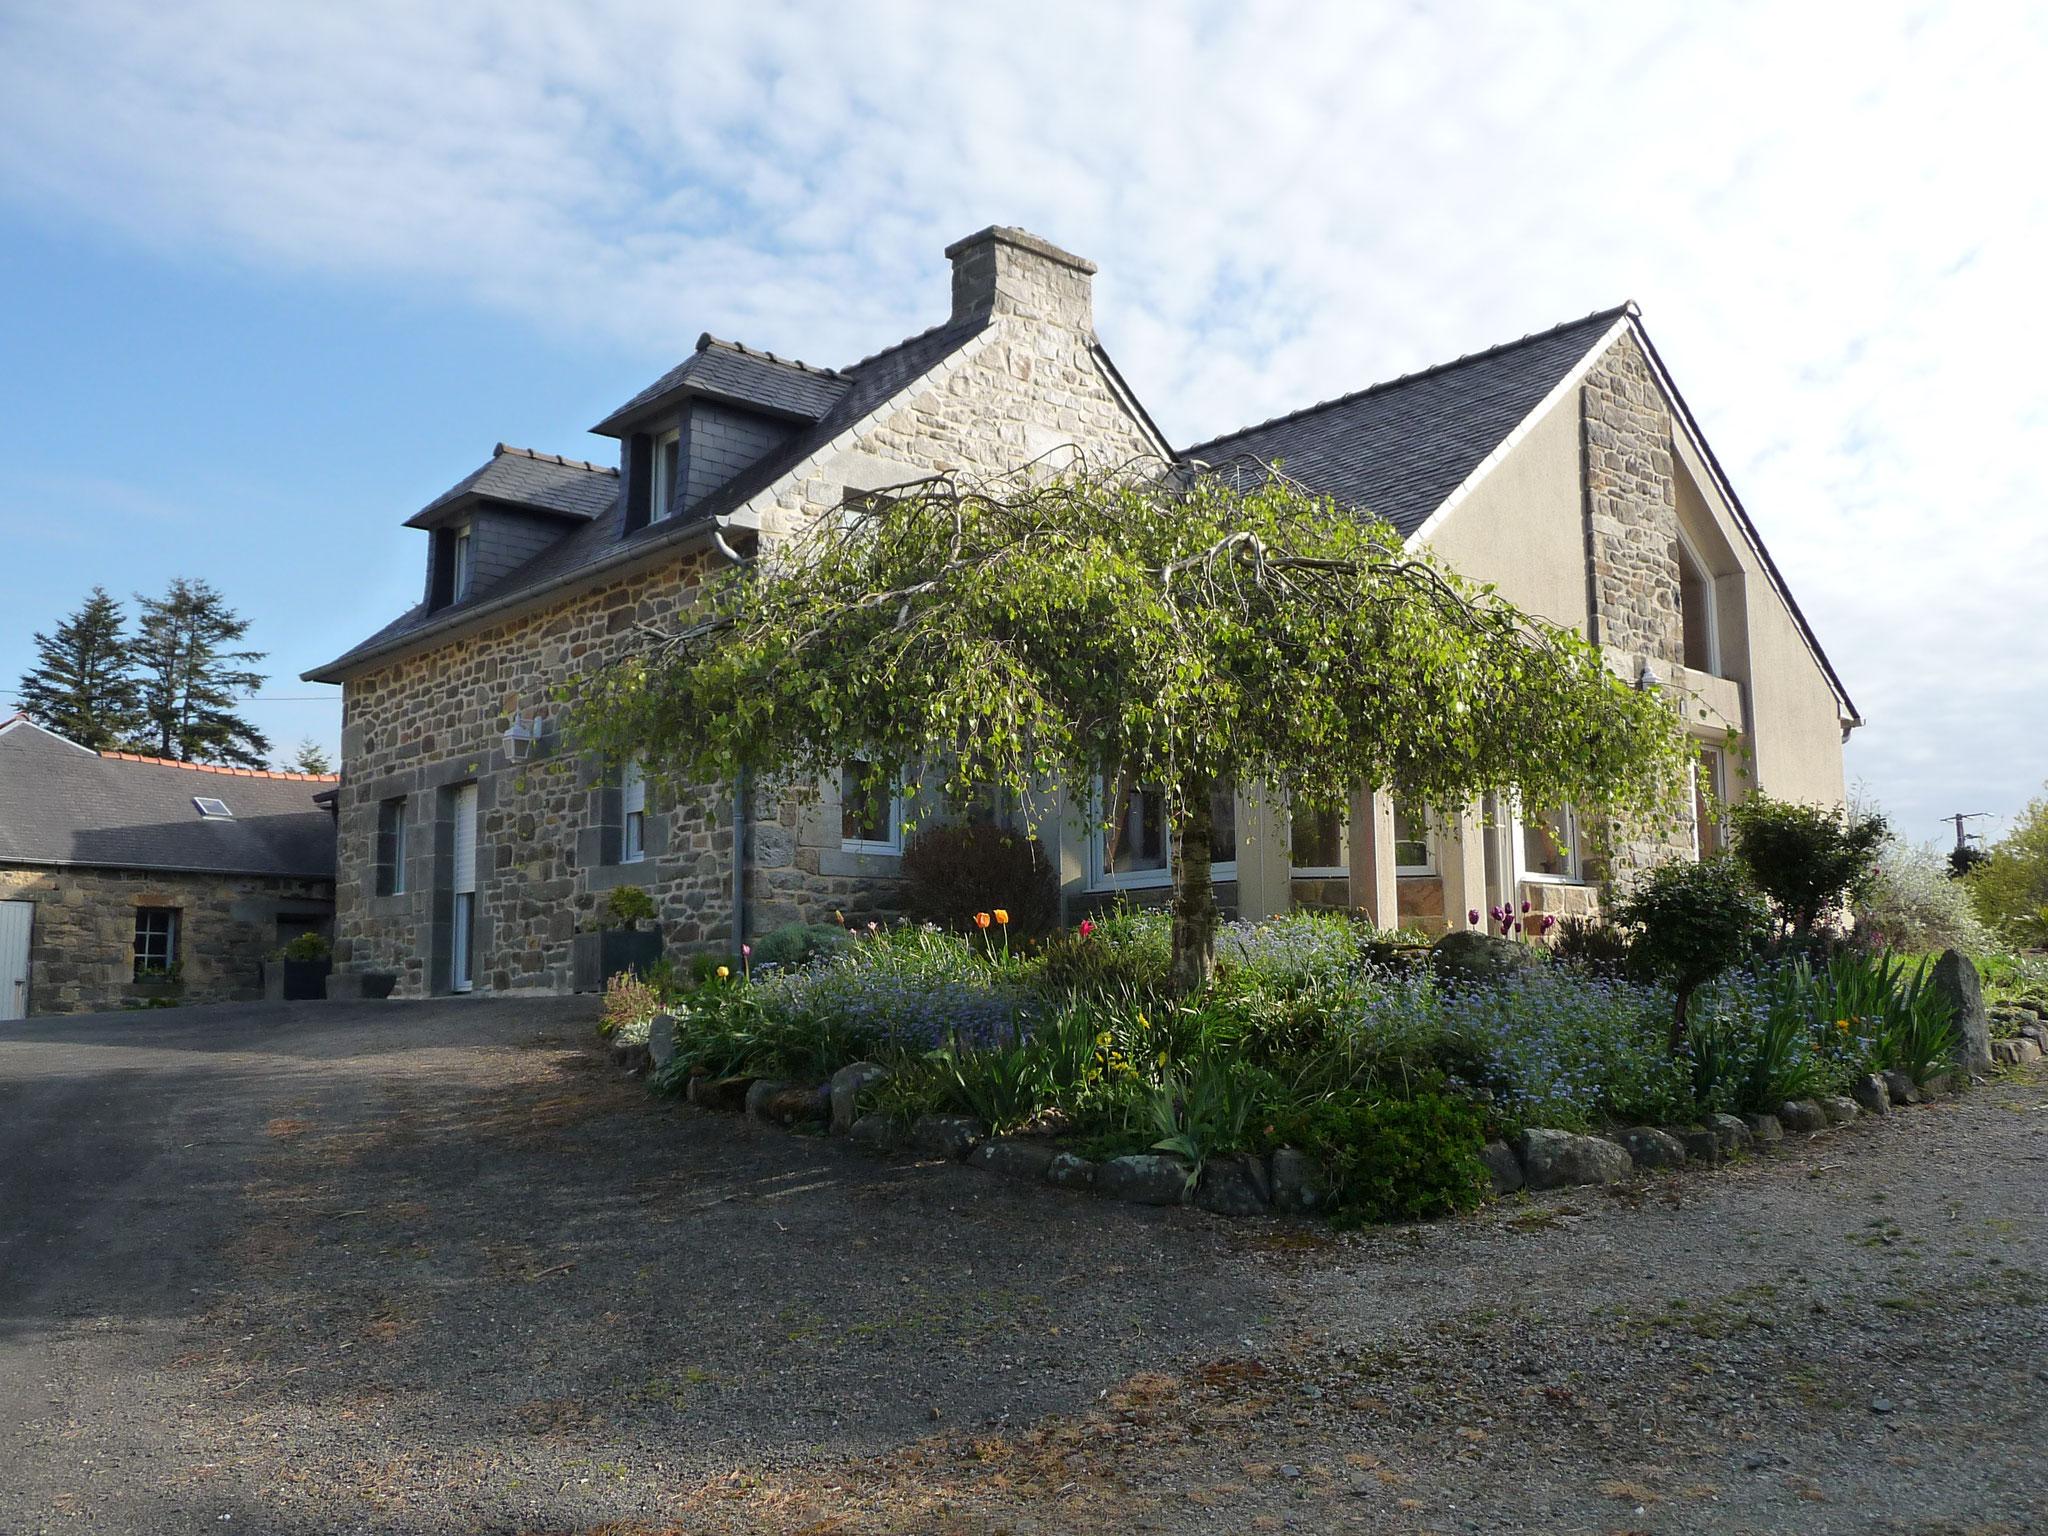 Ferienhaus in La Pointe du Château im Frühling